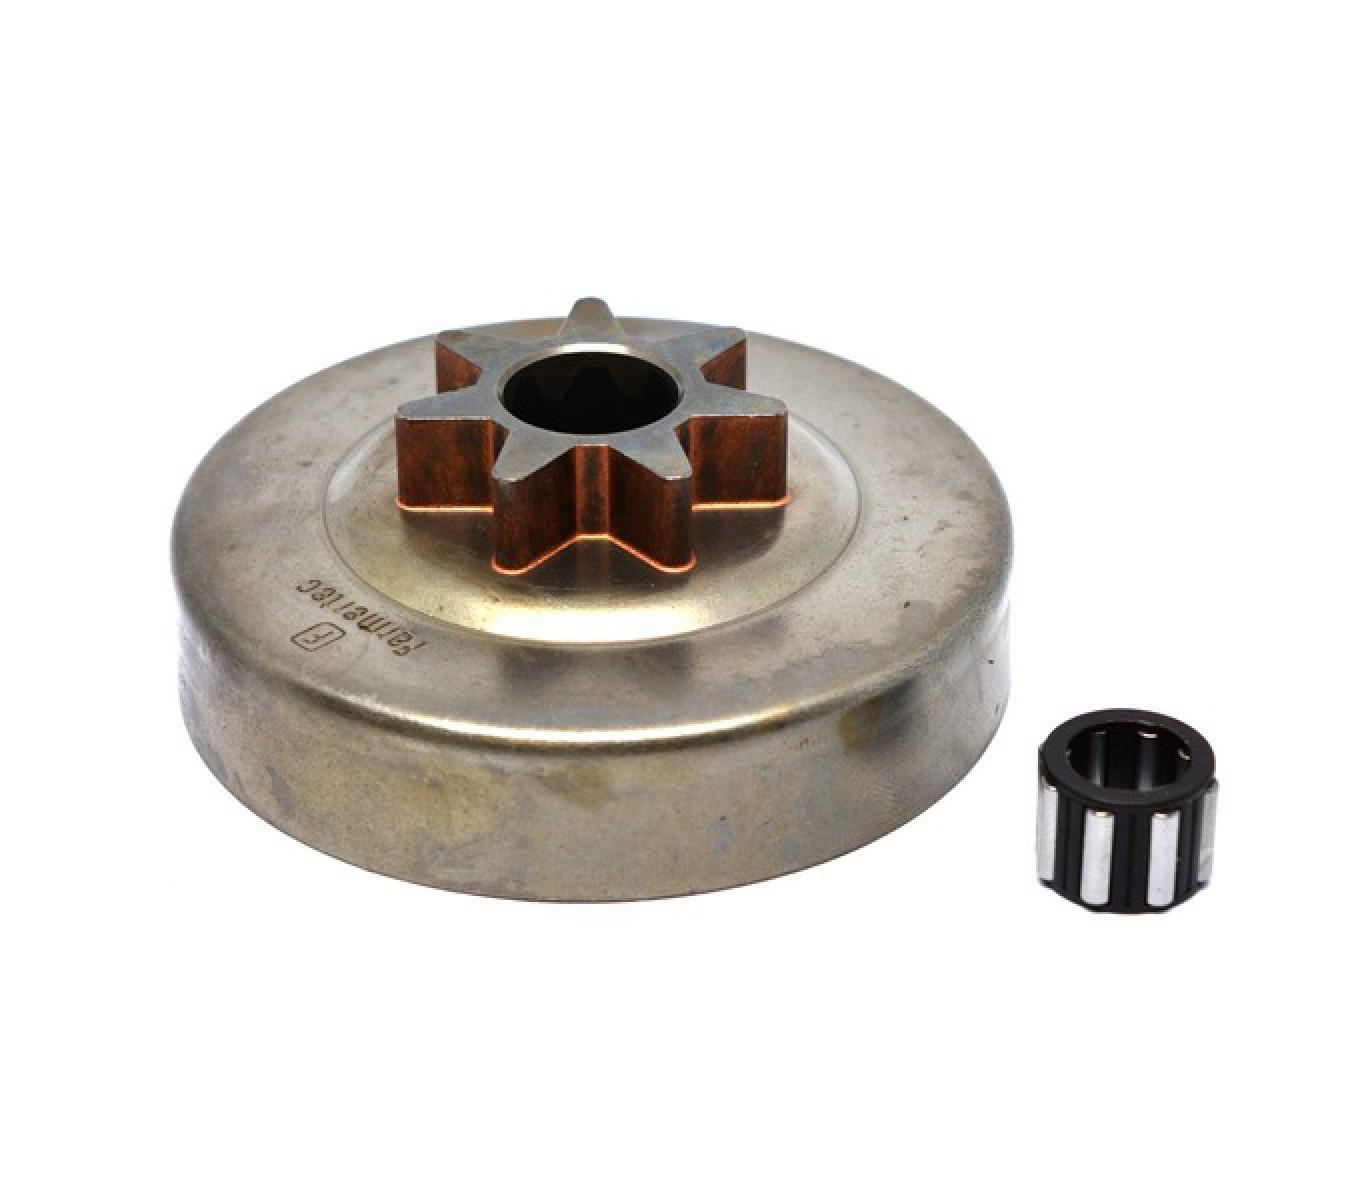 Ozubenie Stihl MS361 MS440 MS460 - 3 8